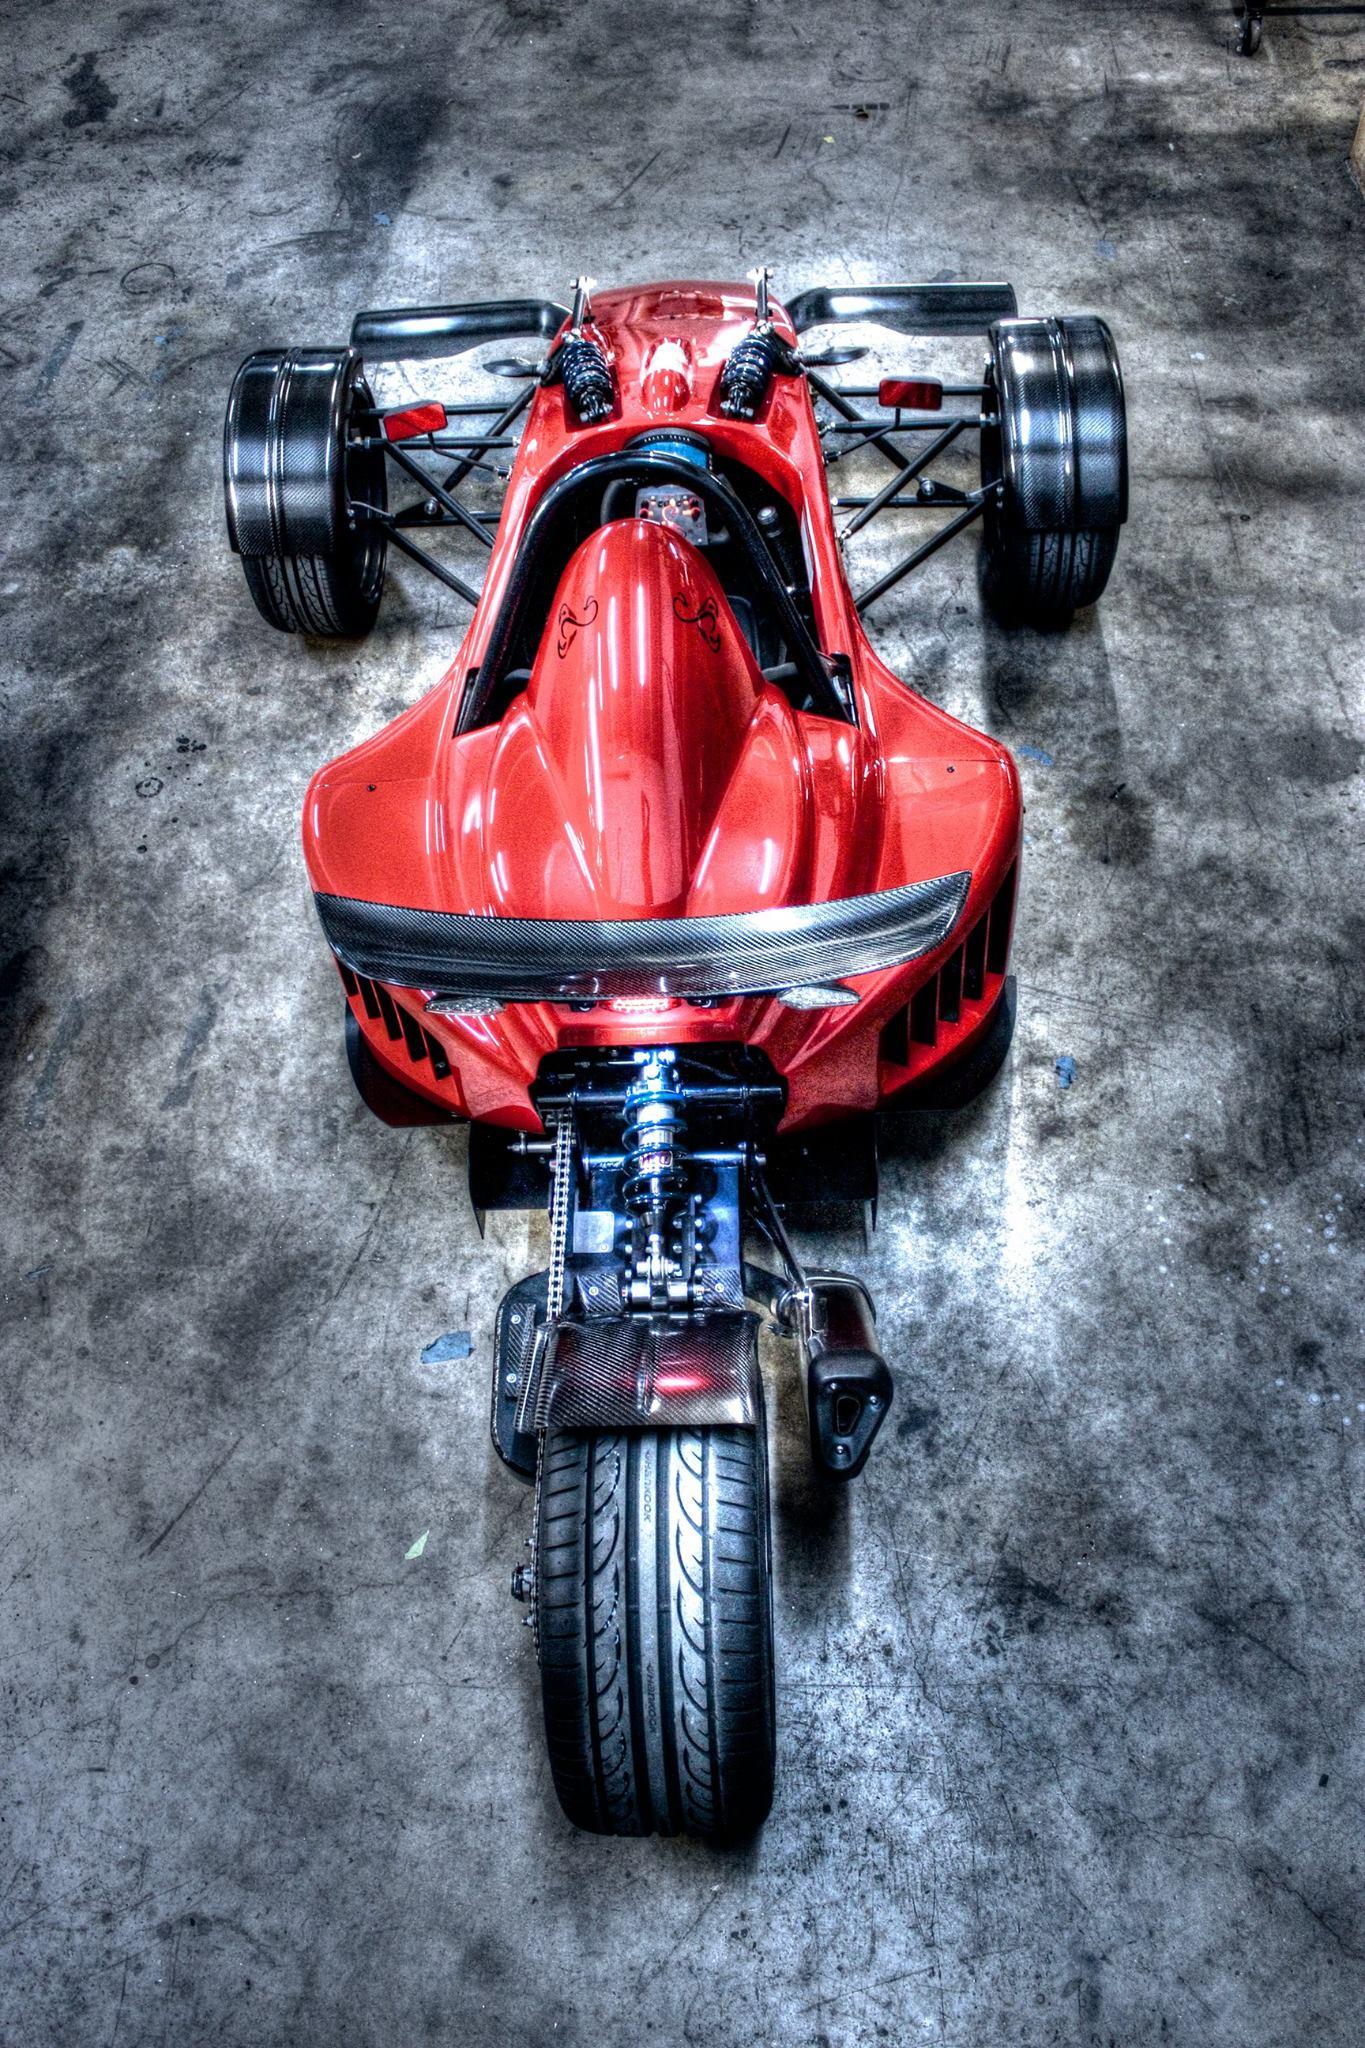 Meet Morgan Wheelers Nemesis The Scorpion P Videophoto Gallery on Morgan Motors